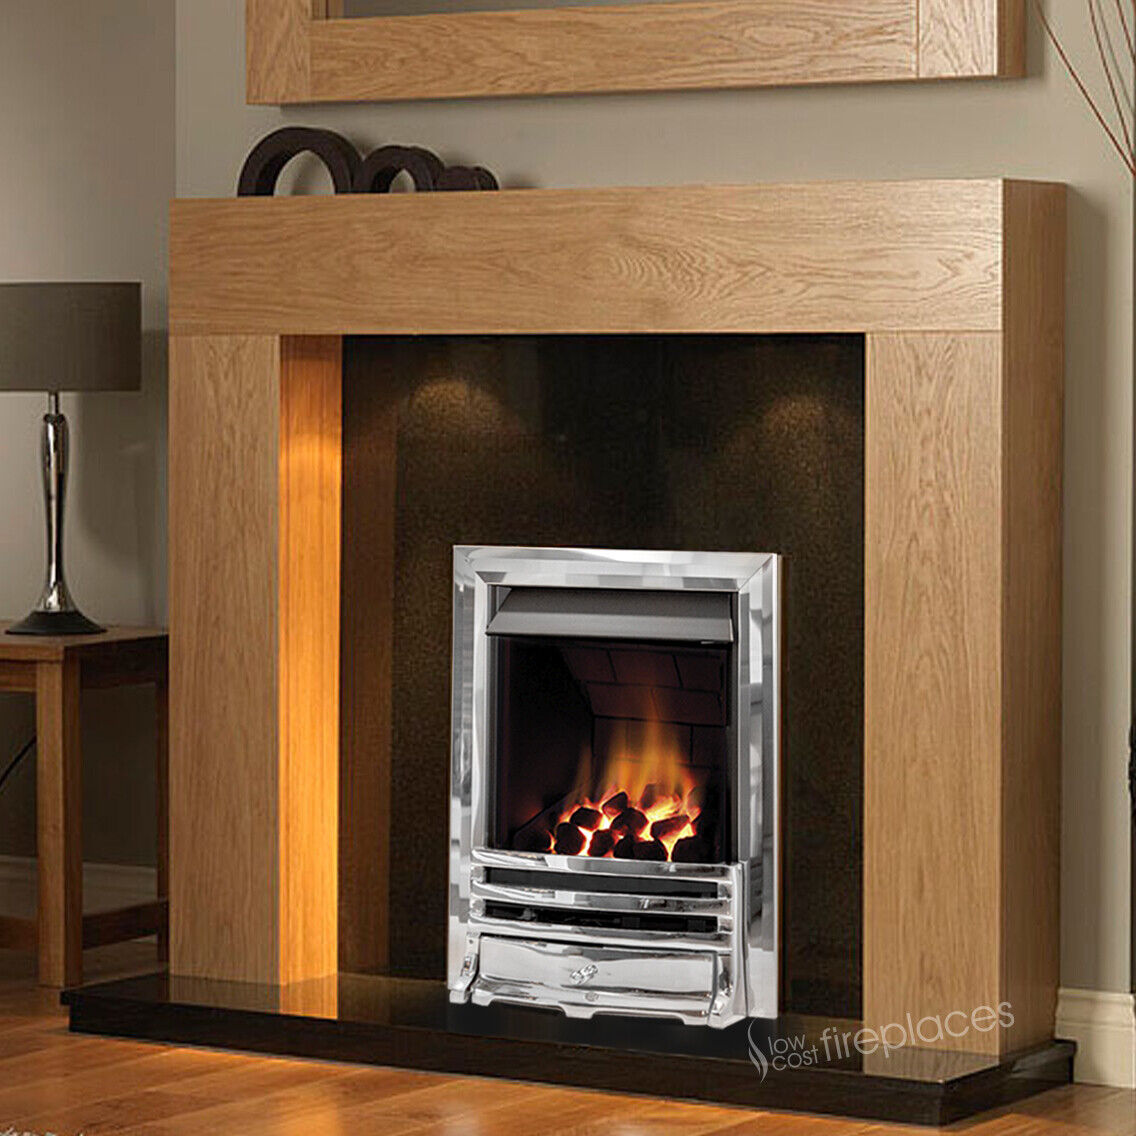 Gas Chrome Oak Surround Black Granite Stone Big Fire Fireplace Suite Lights 54 Ebay